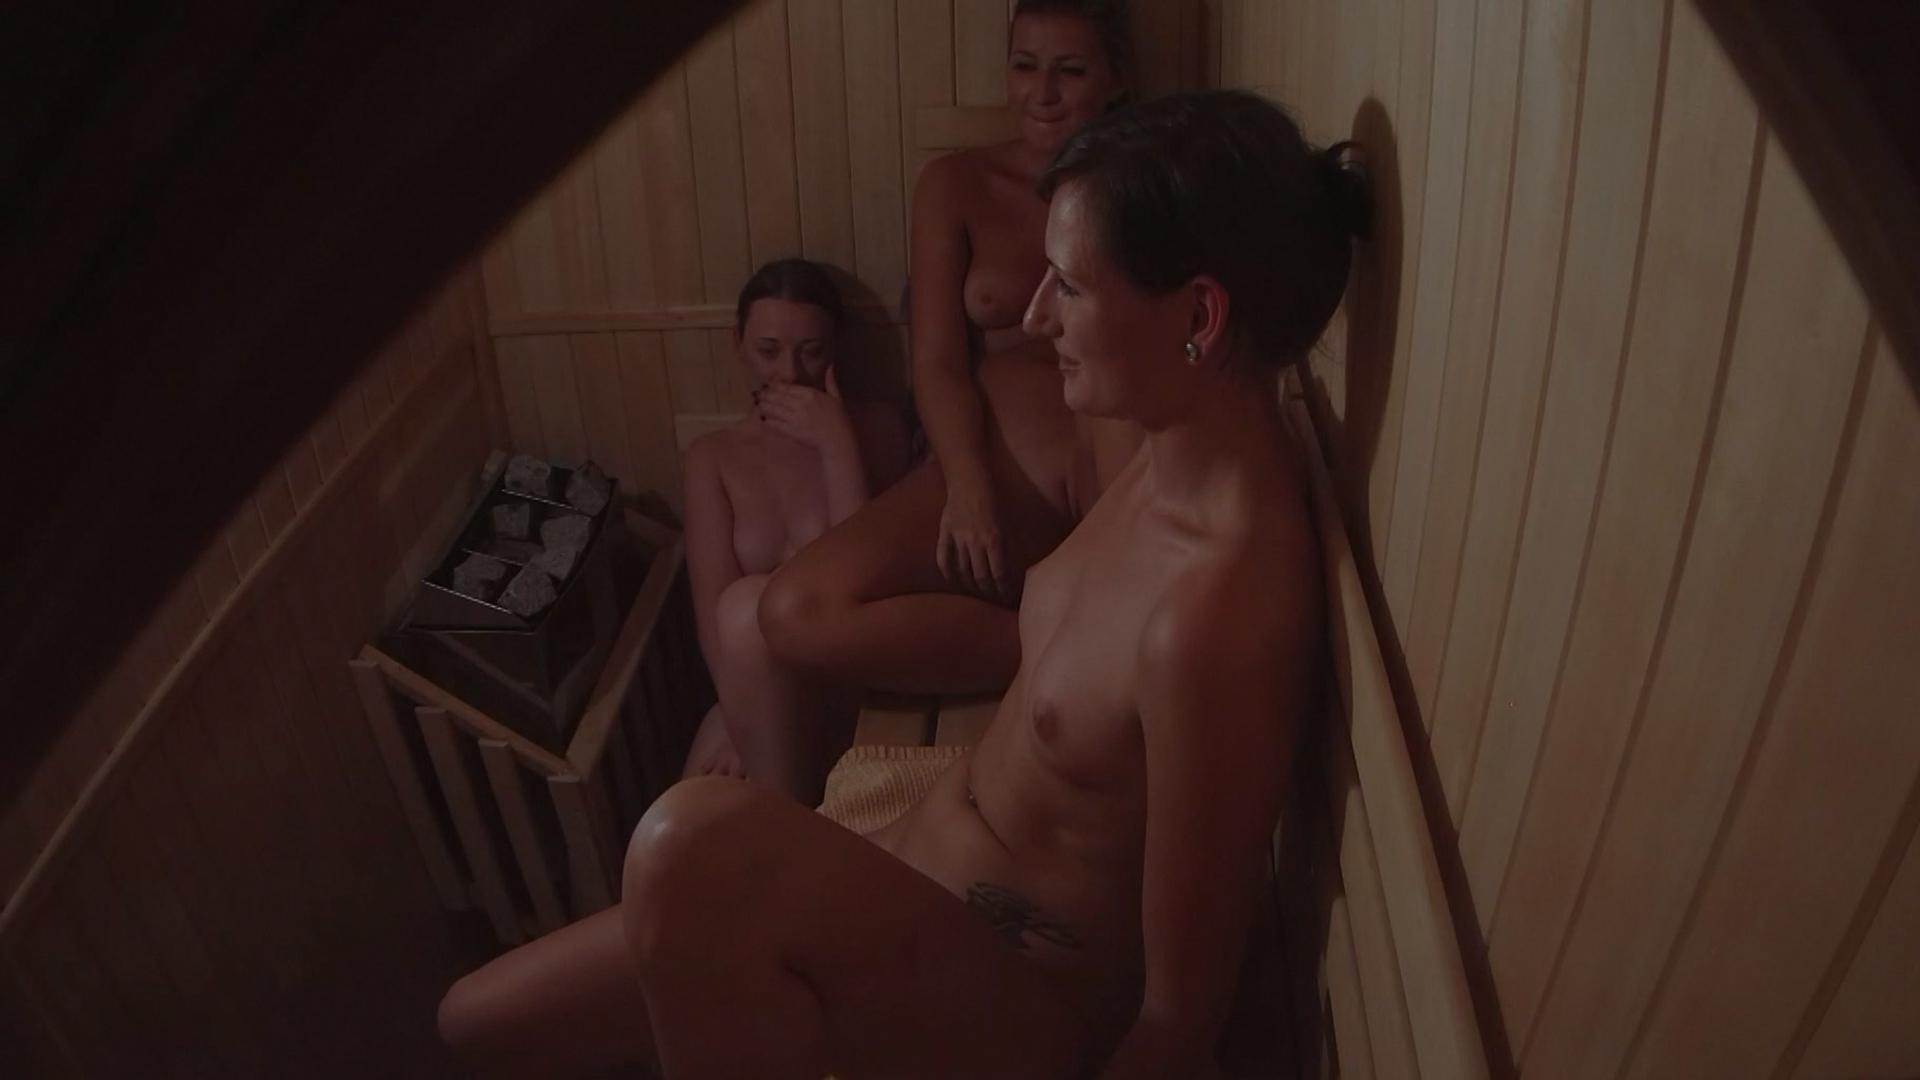 скрытая камера порно в сауне связи